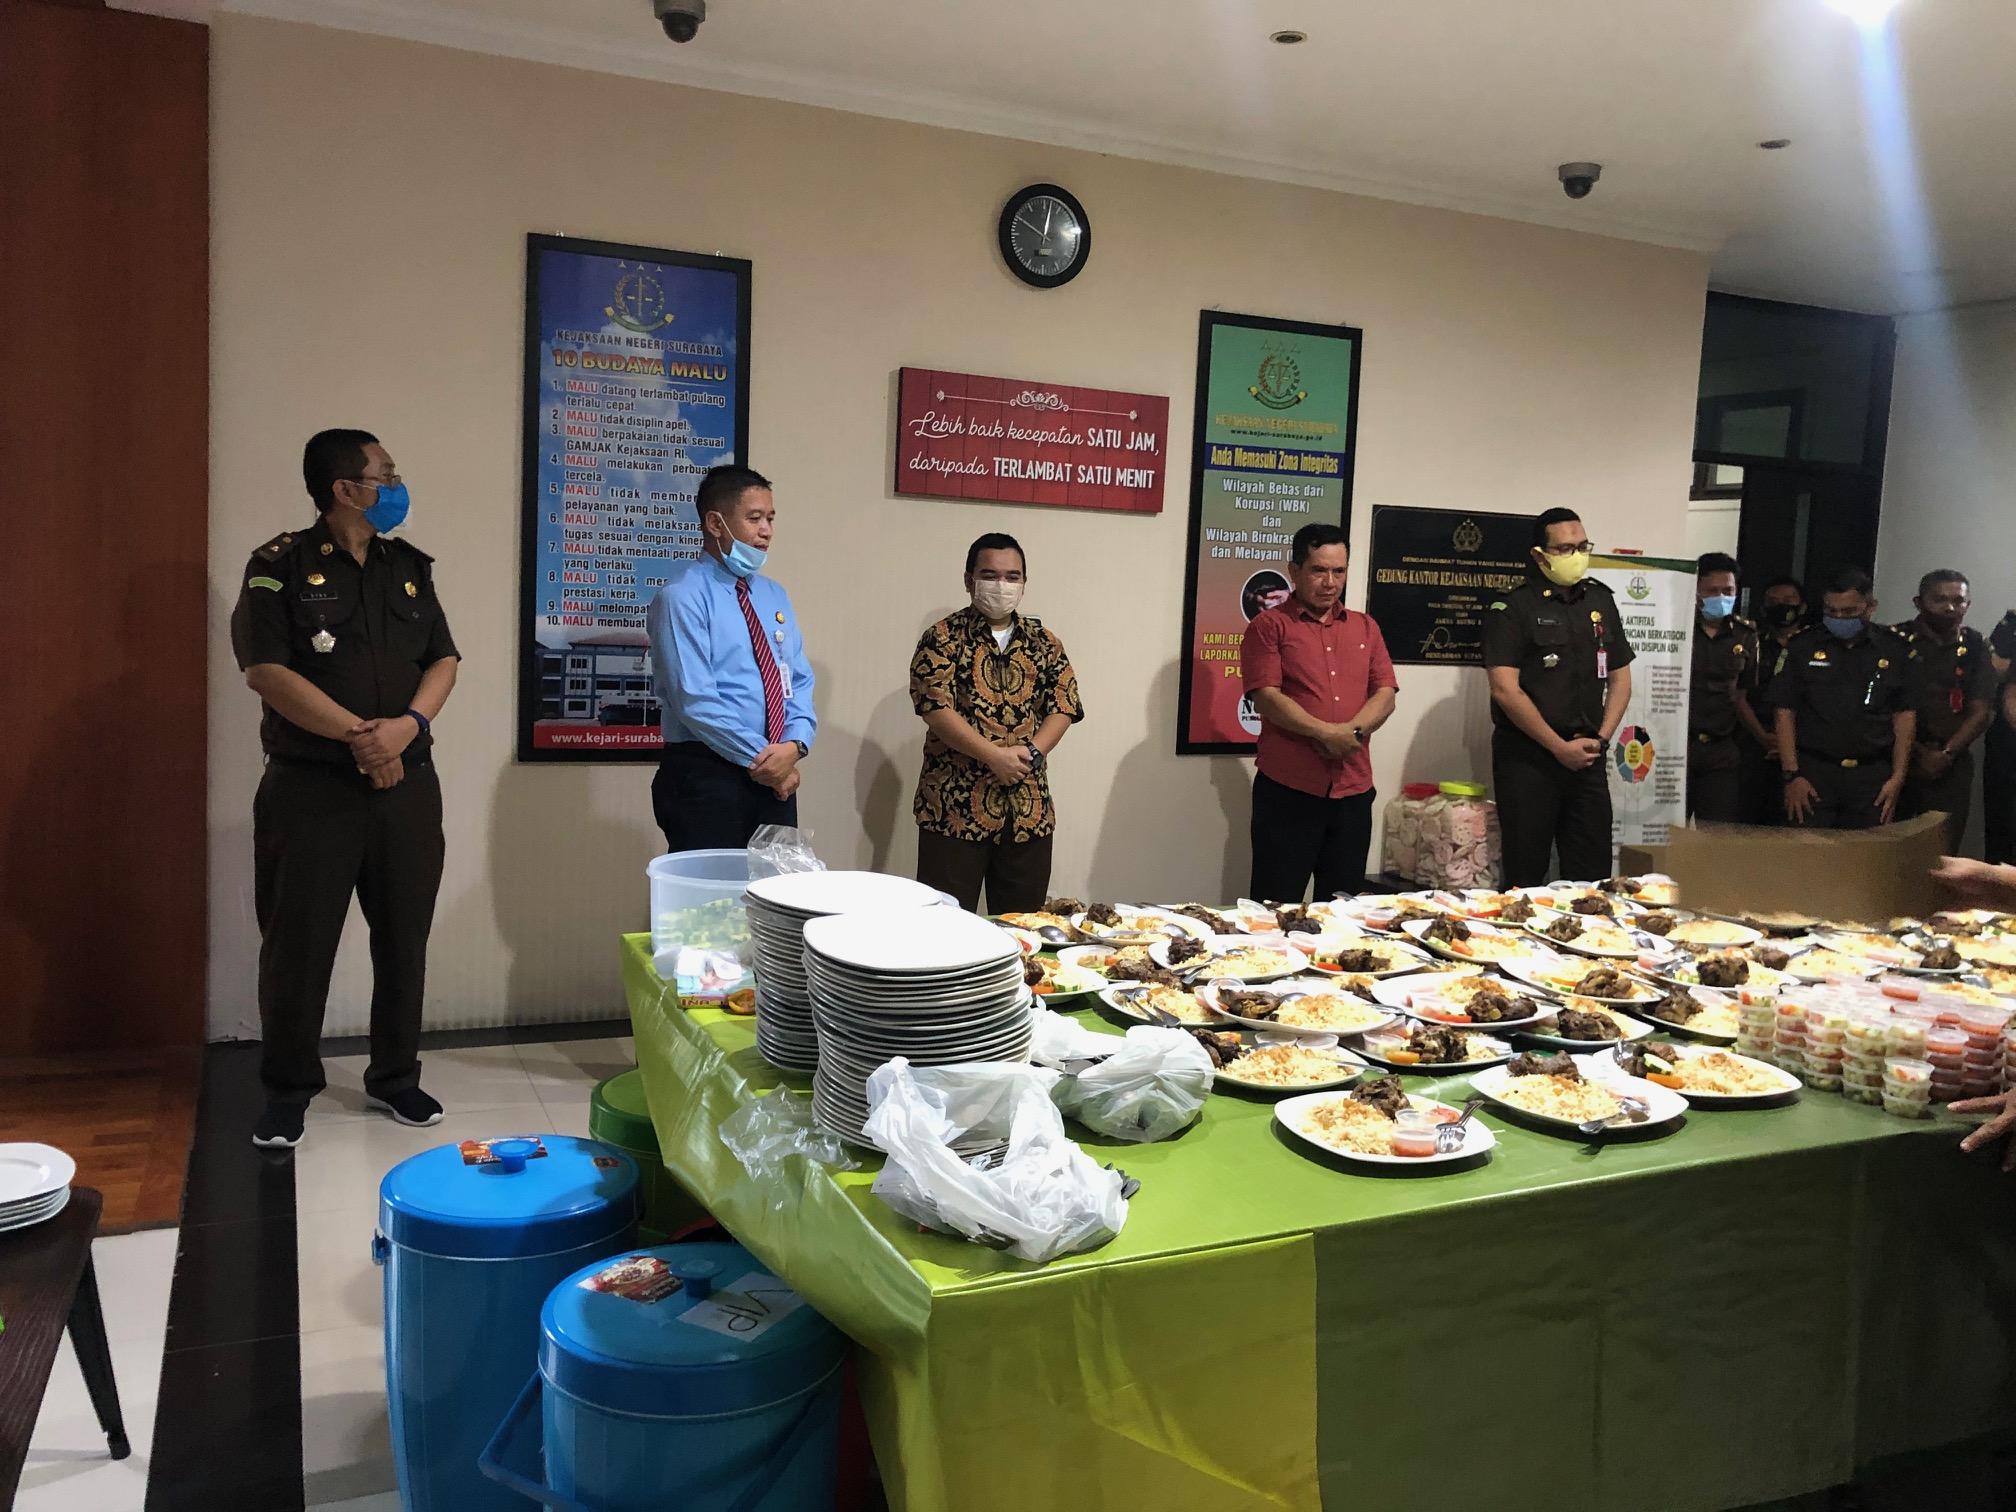 berdoa dan makan pagi bersama  seluruh pegawai Kejari Surabaya setelah libur lebaran 26-05-2020